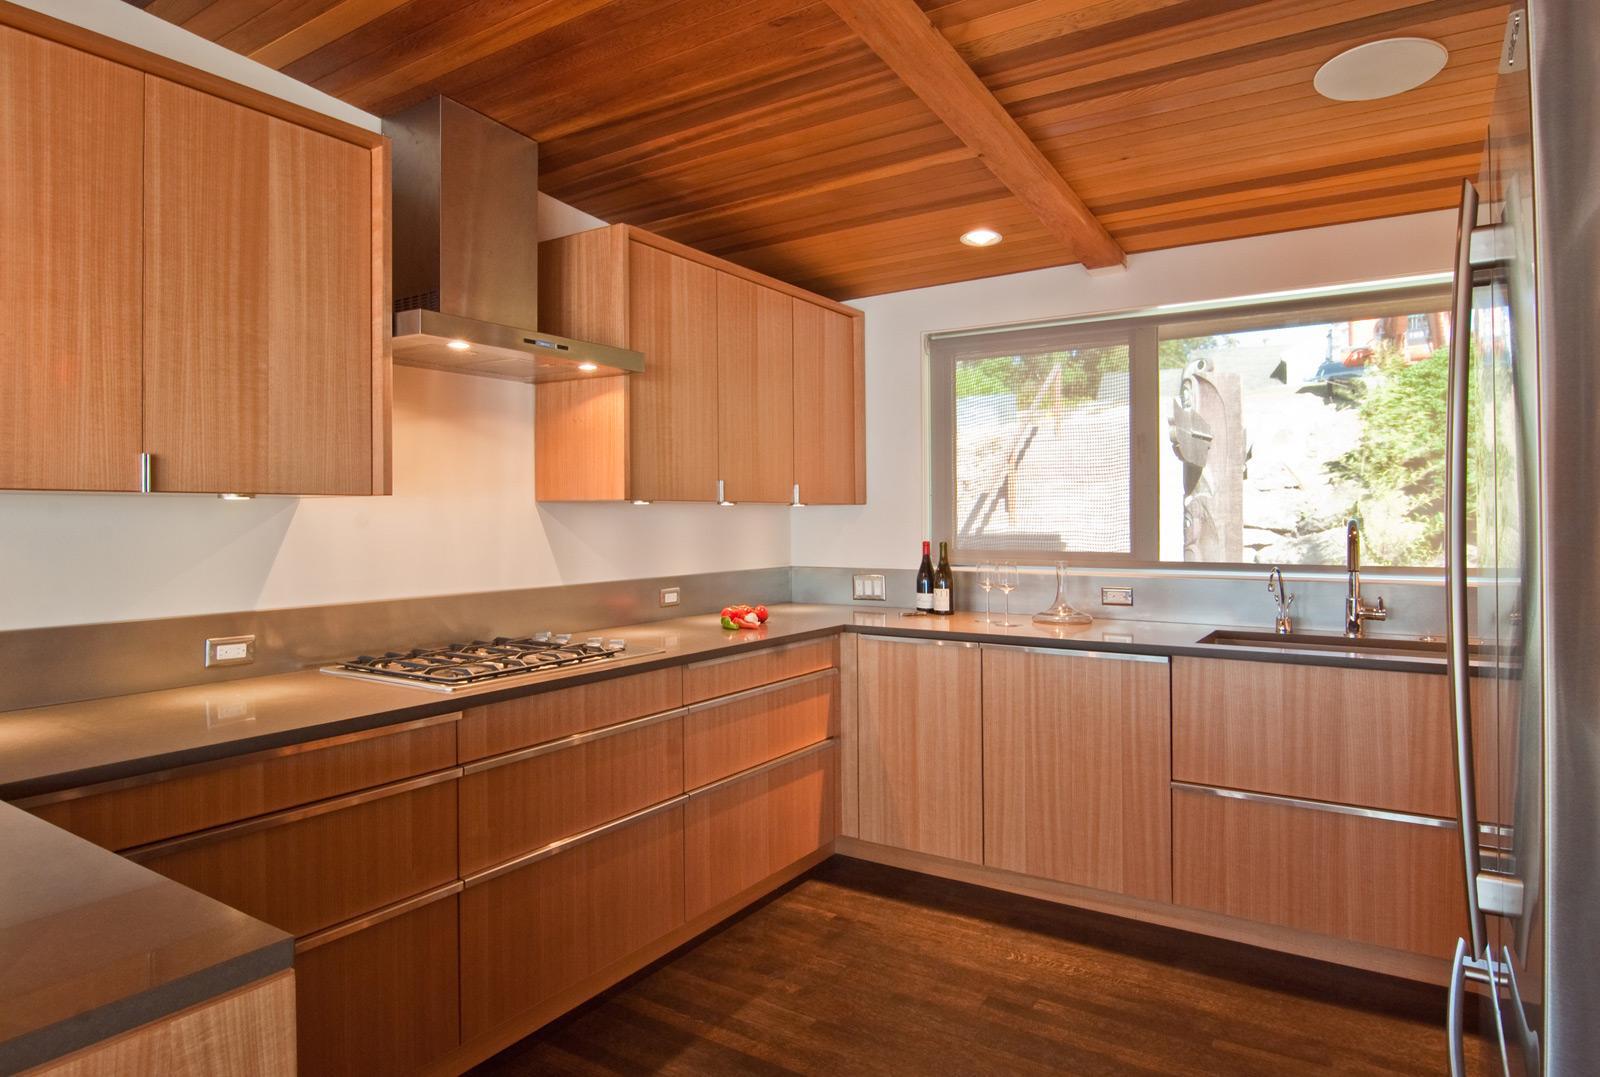 design strategies for kitchen hood venting kitchen island vent BUILD LLC Risley